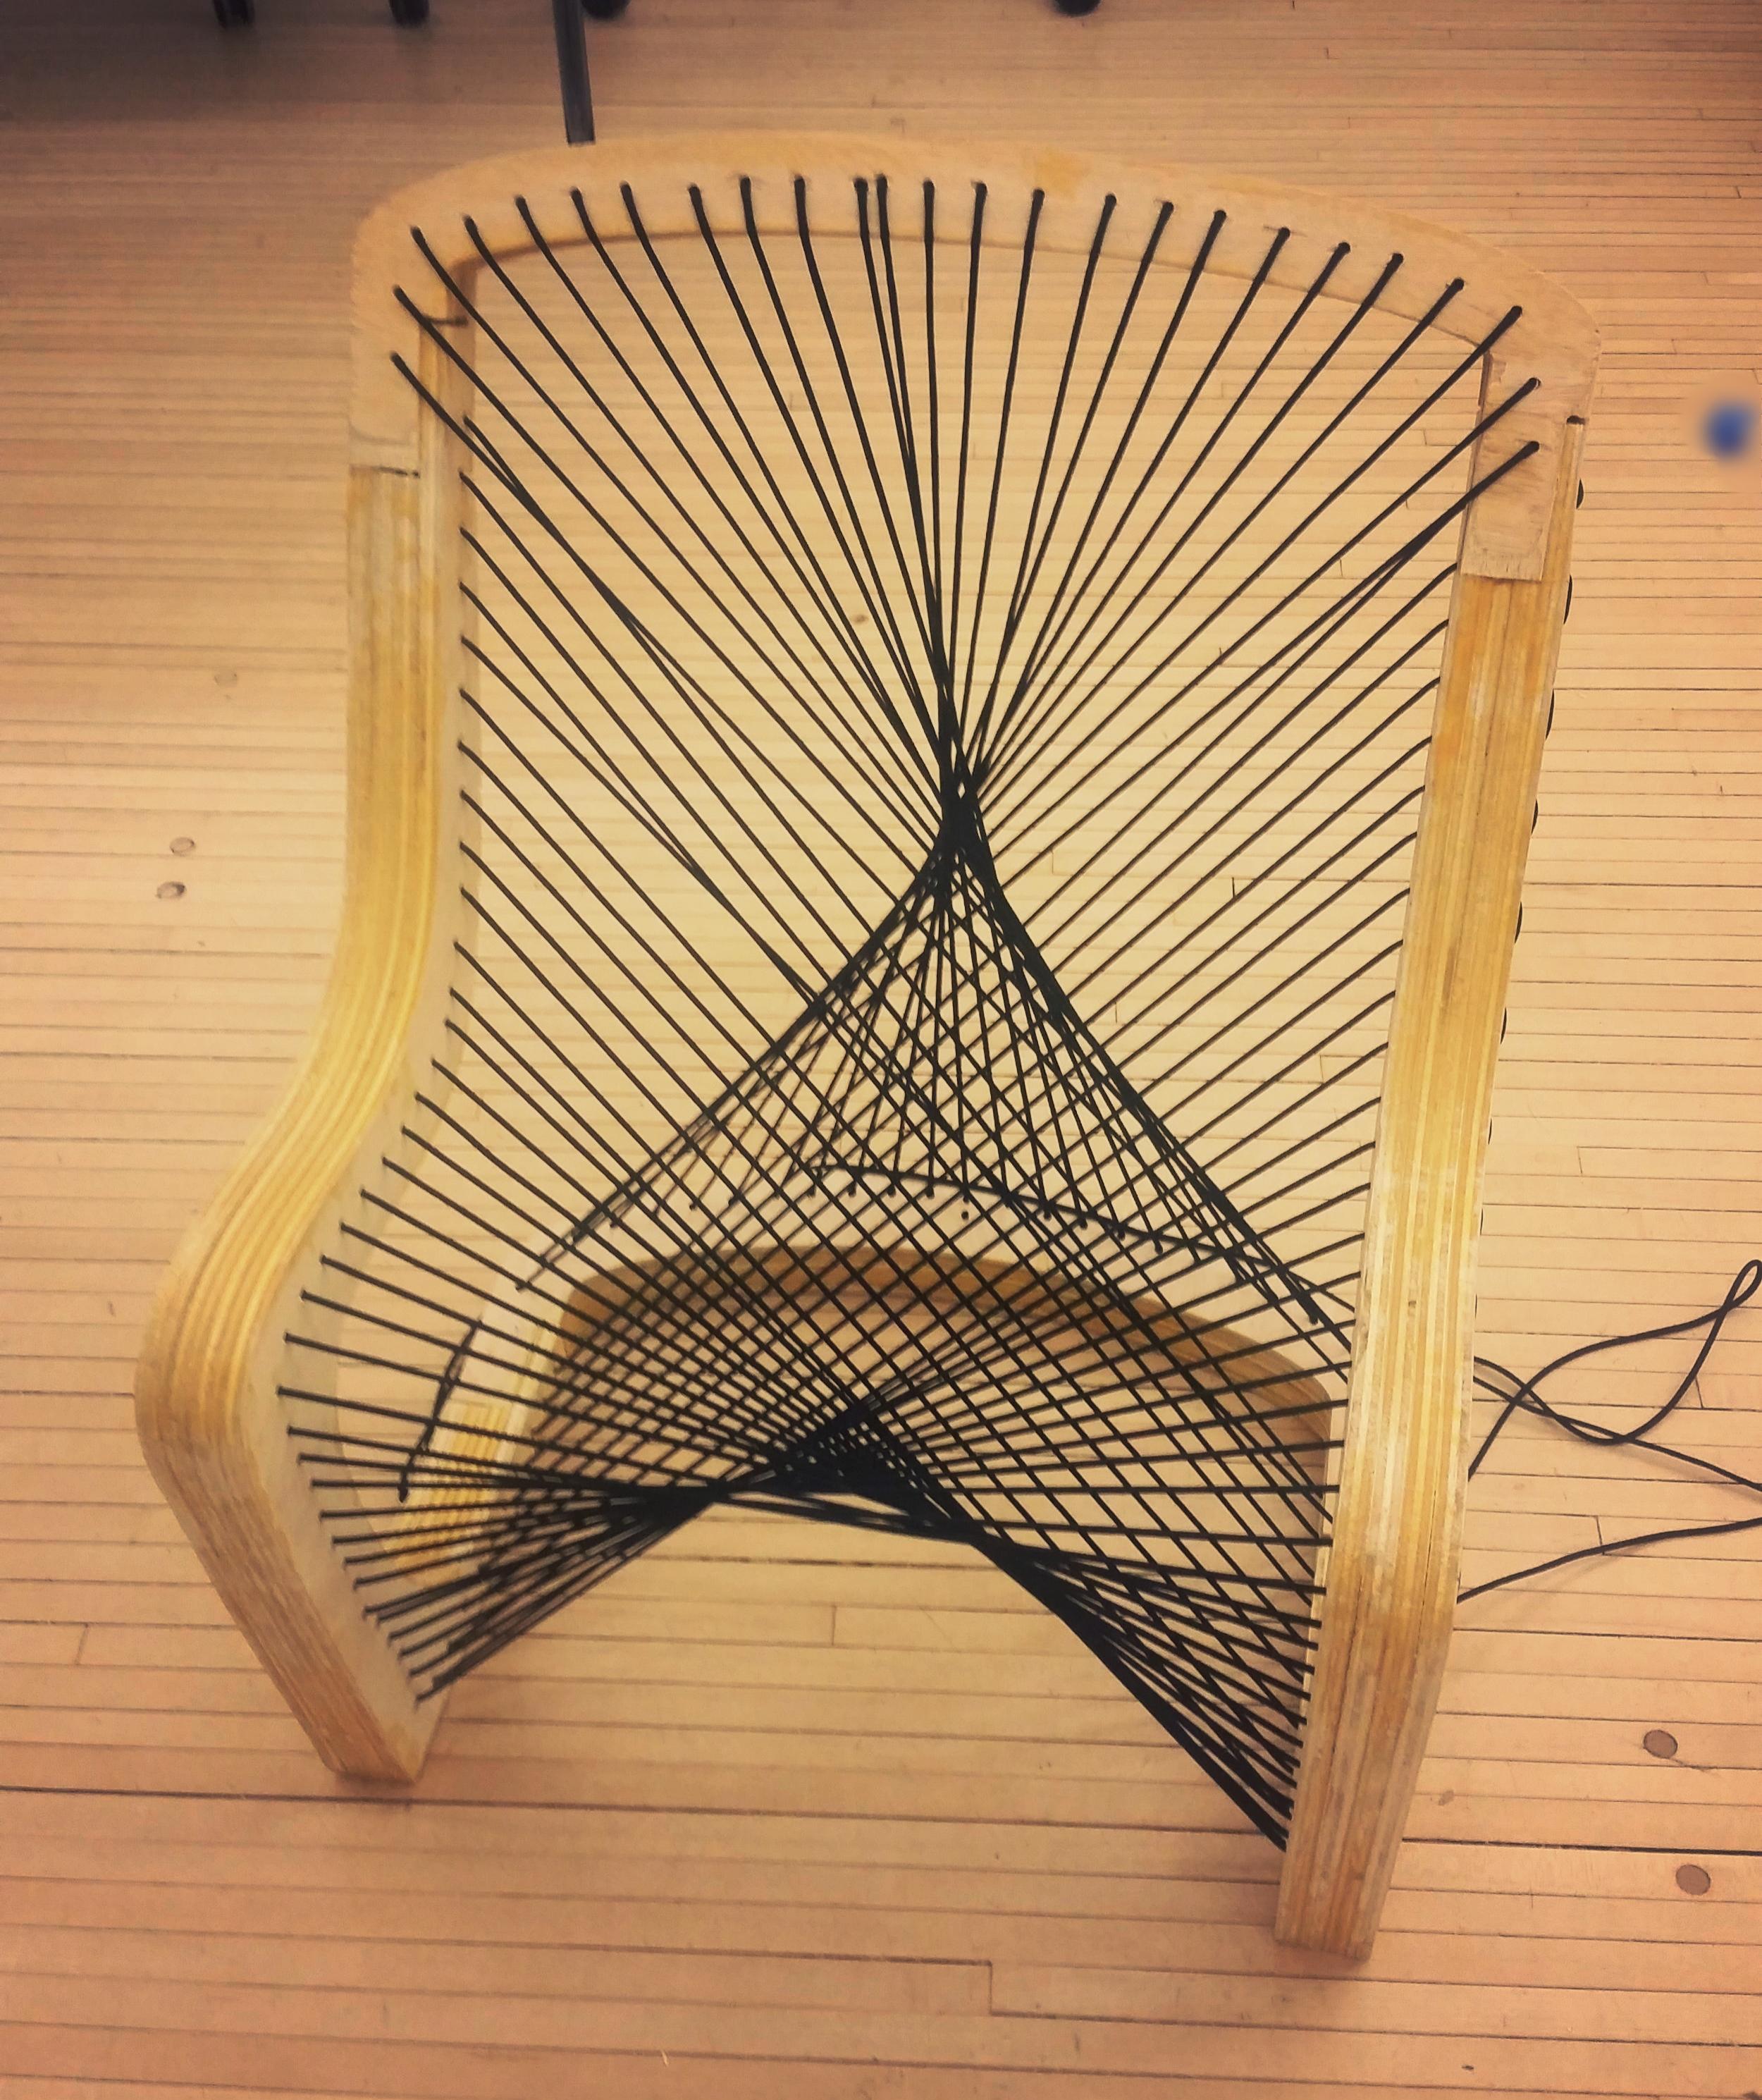 The final chair